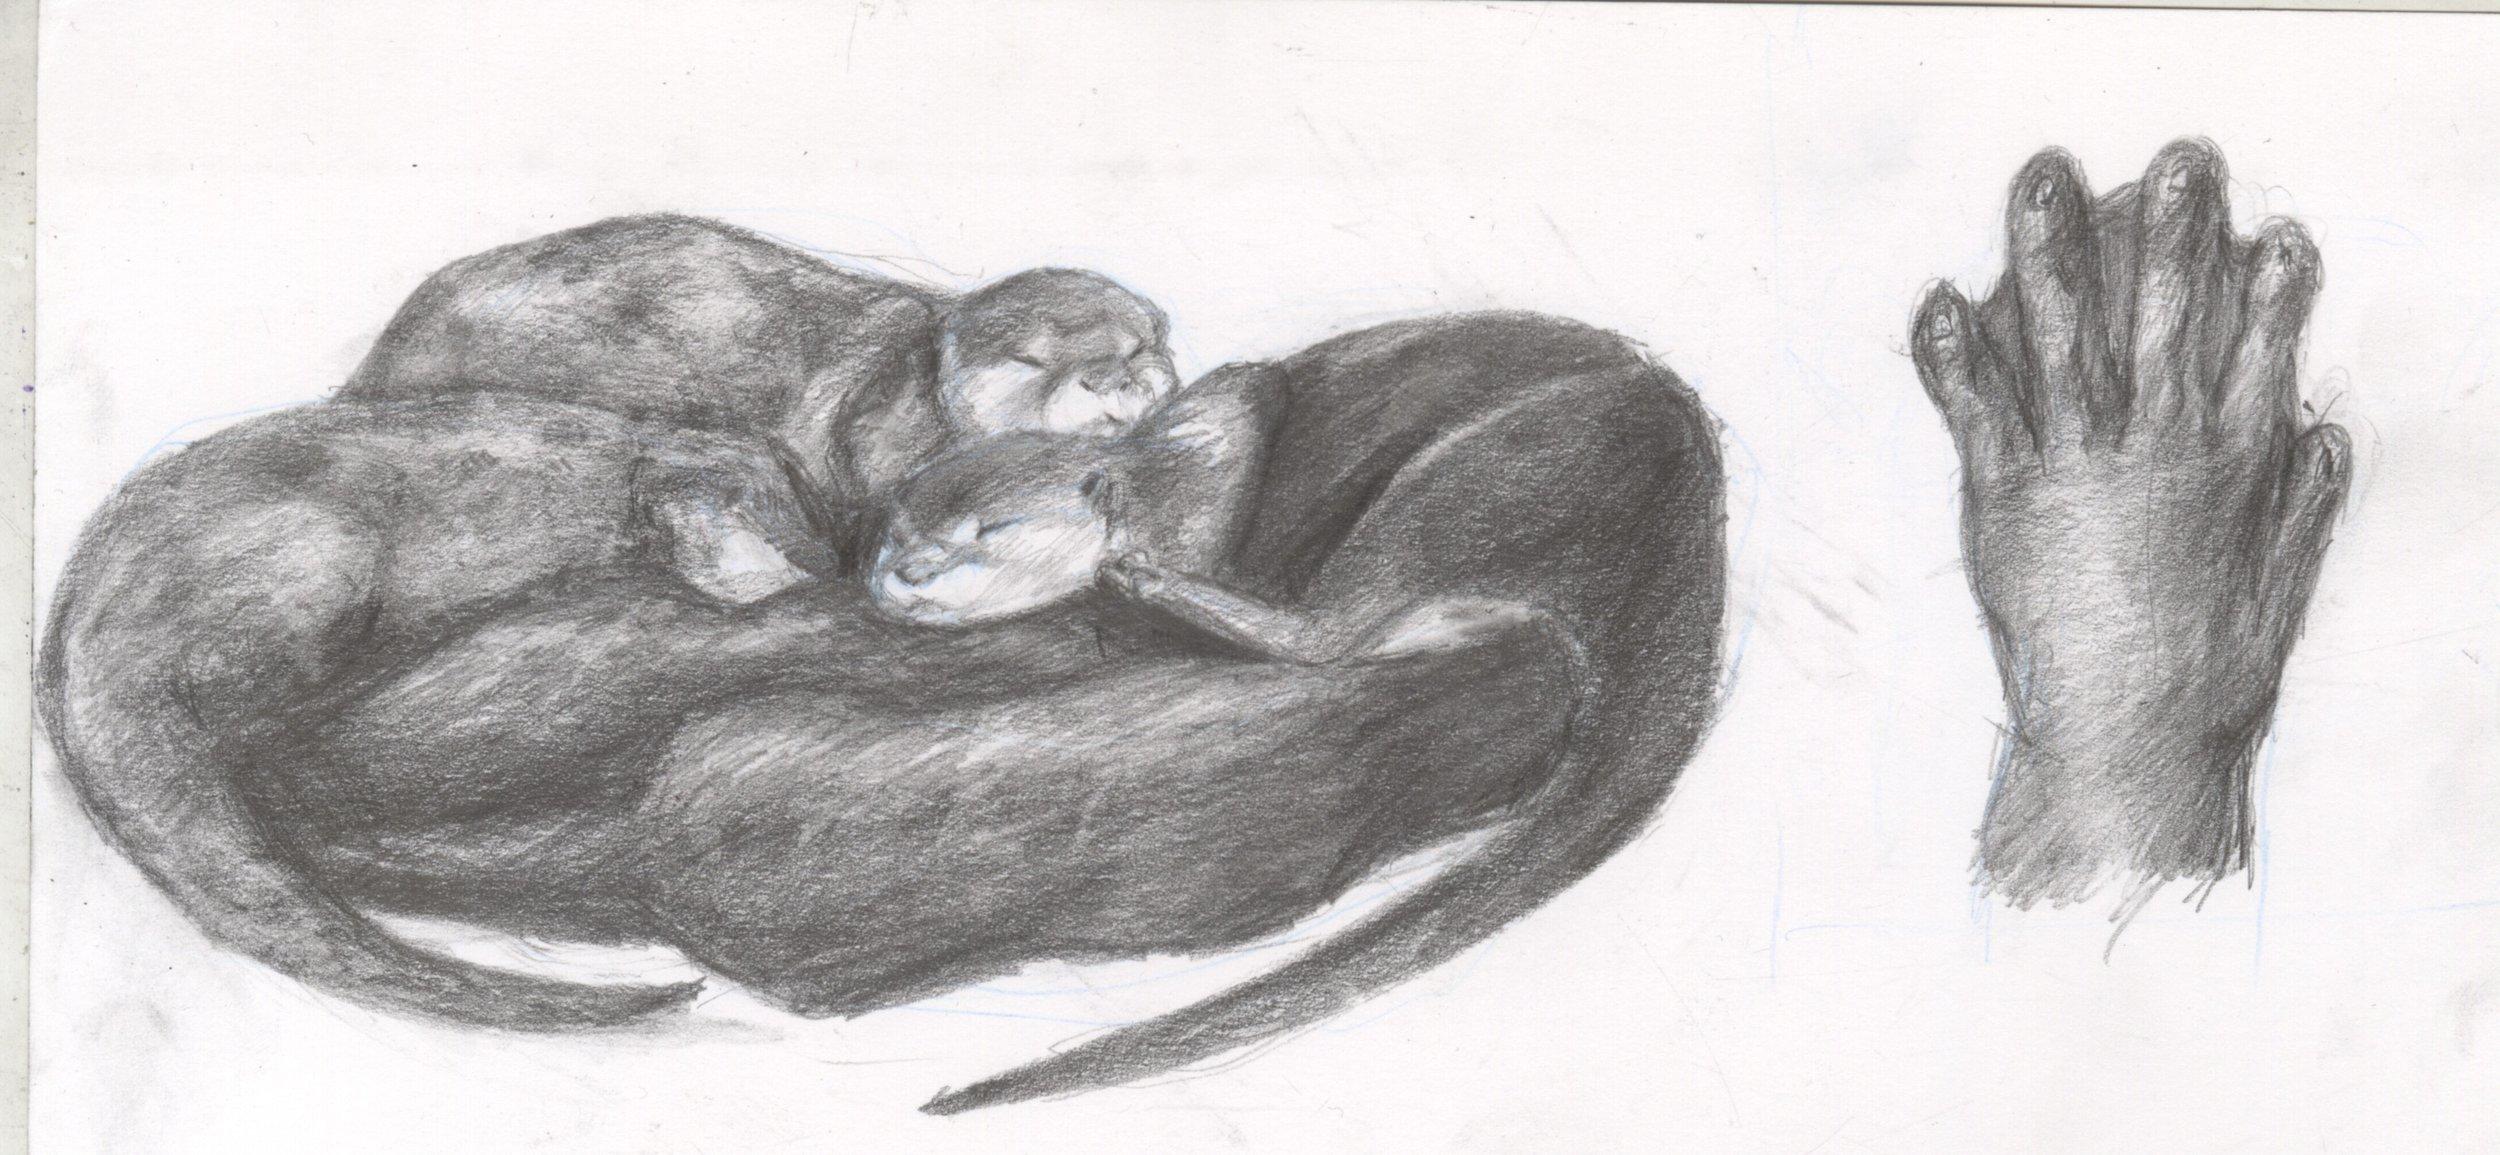 otter sketches batch 2.jpg